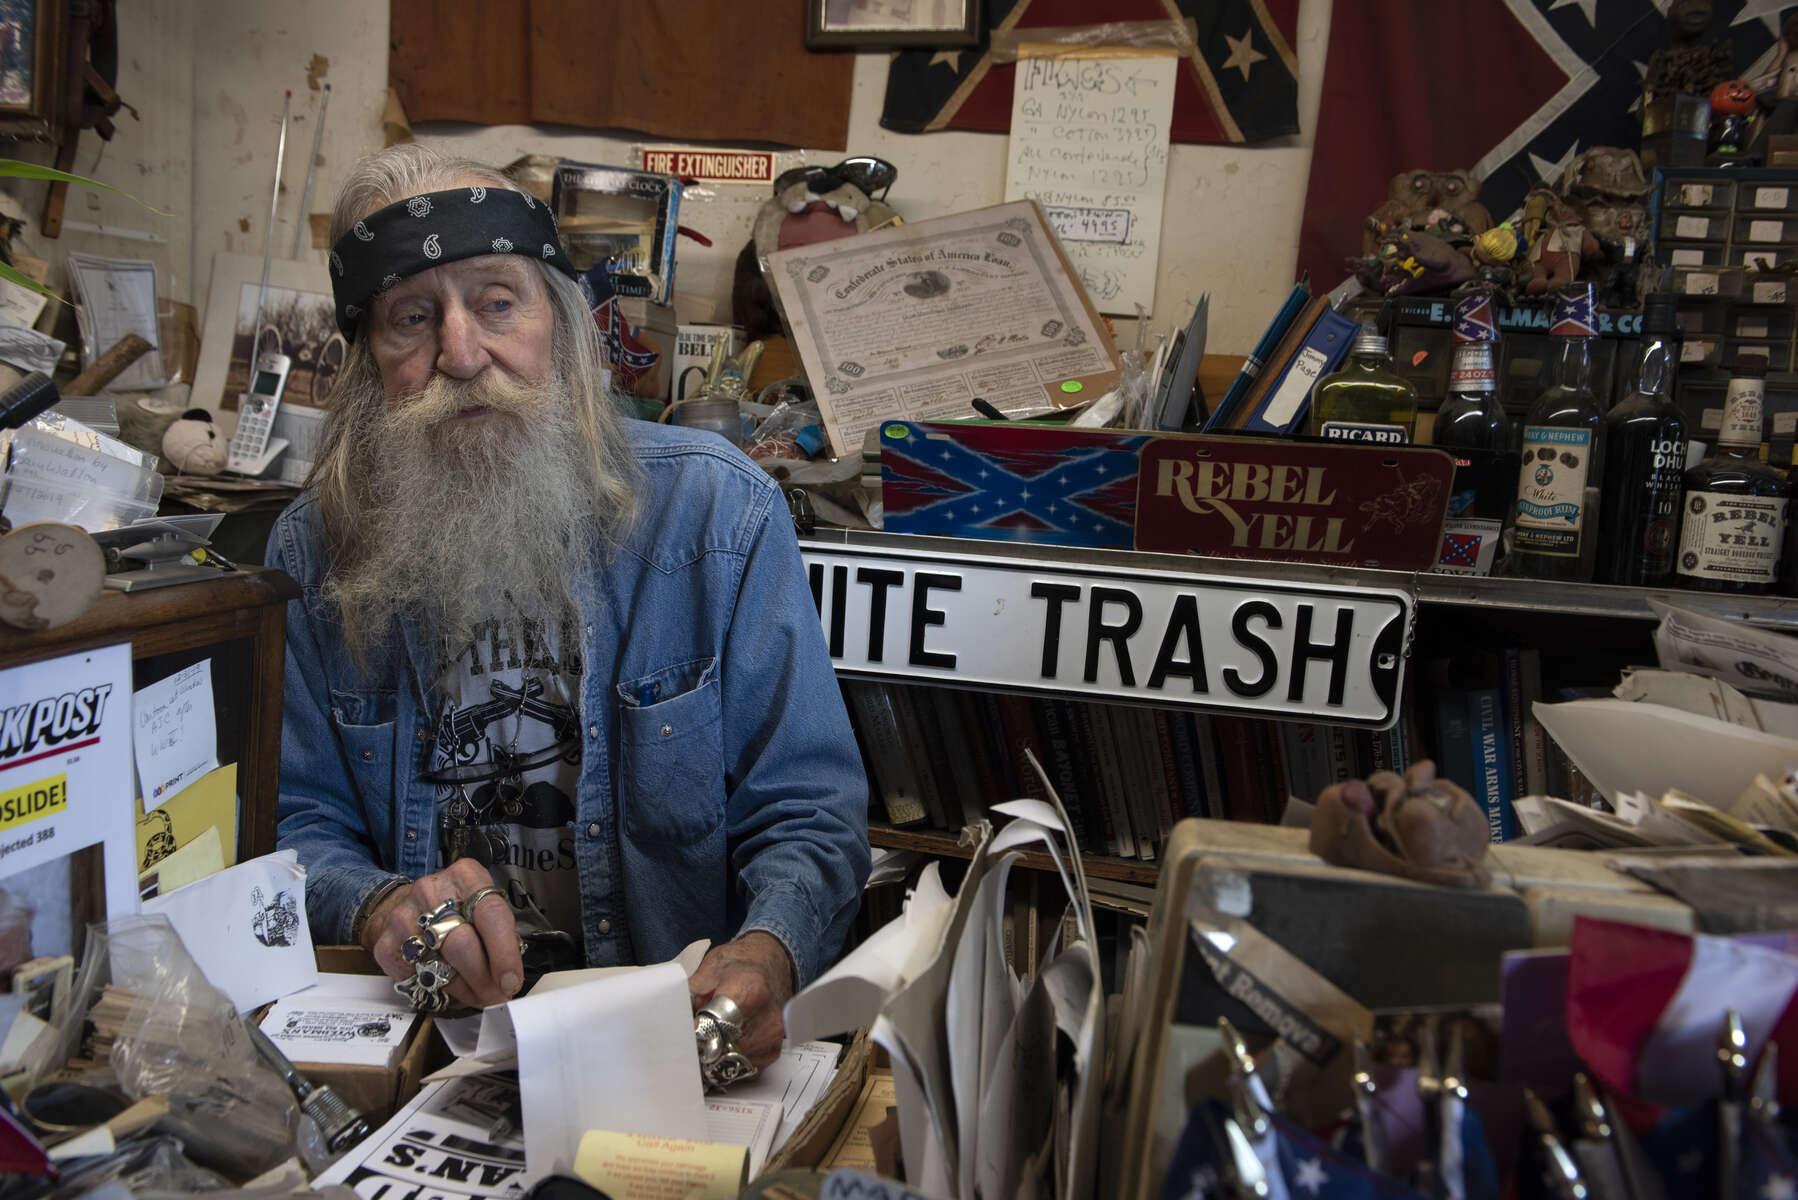 Dent Myers in his cluttered 'Wildman's 'Civil War Surplus shop.